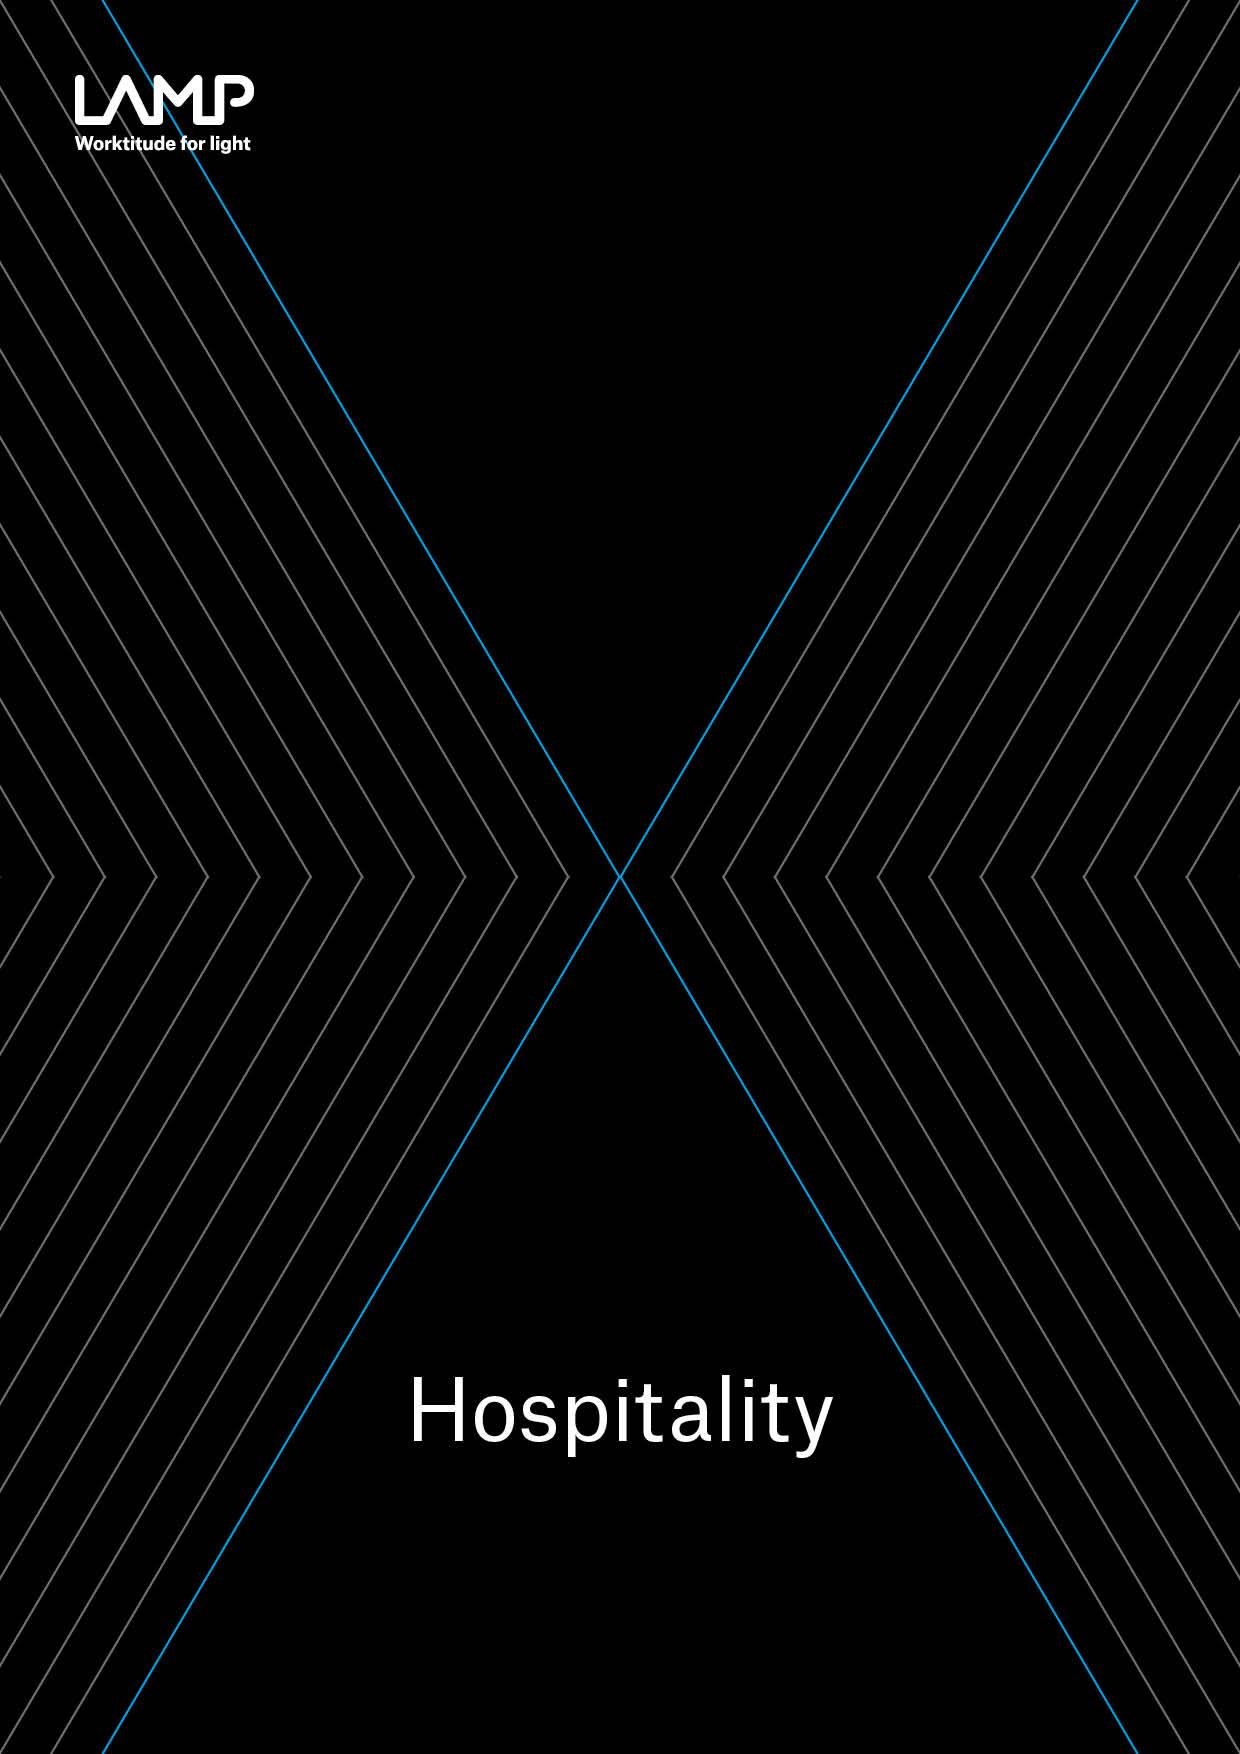 Portada hospitality